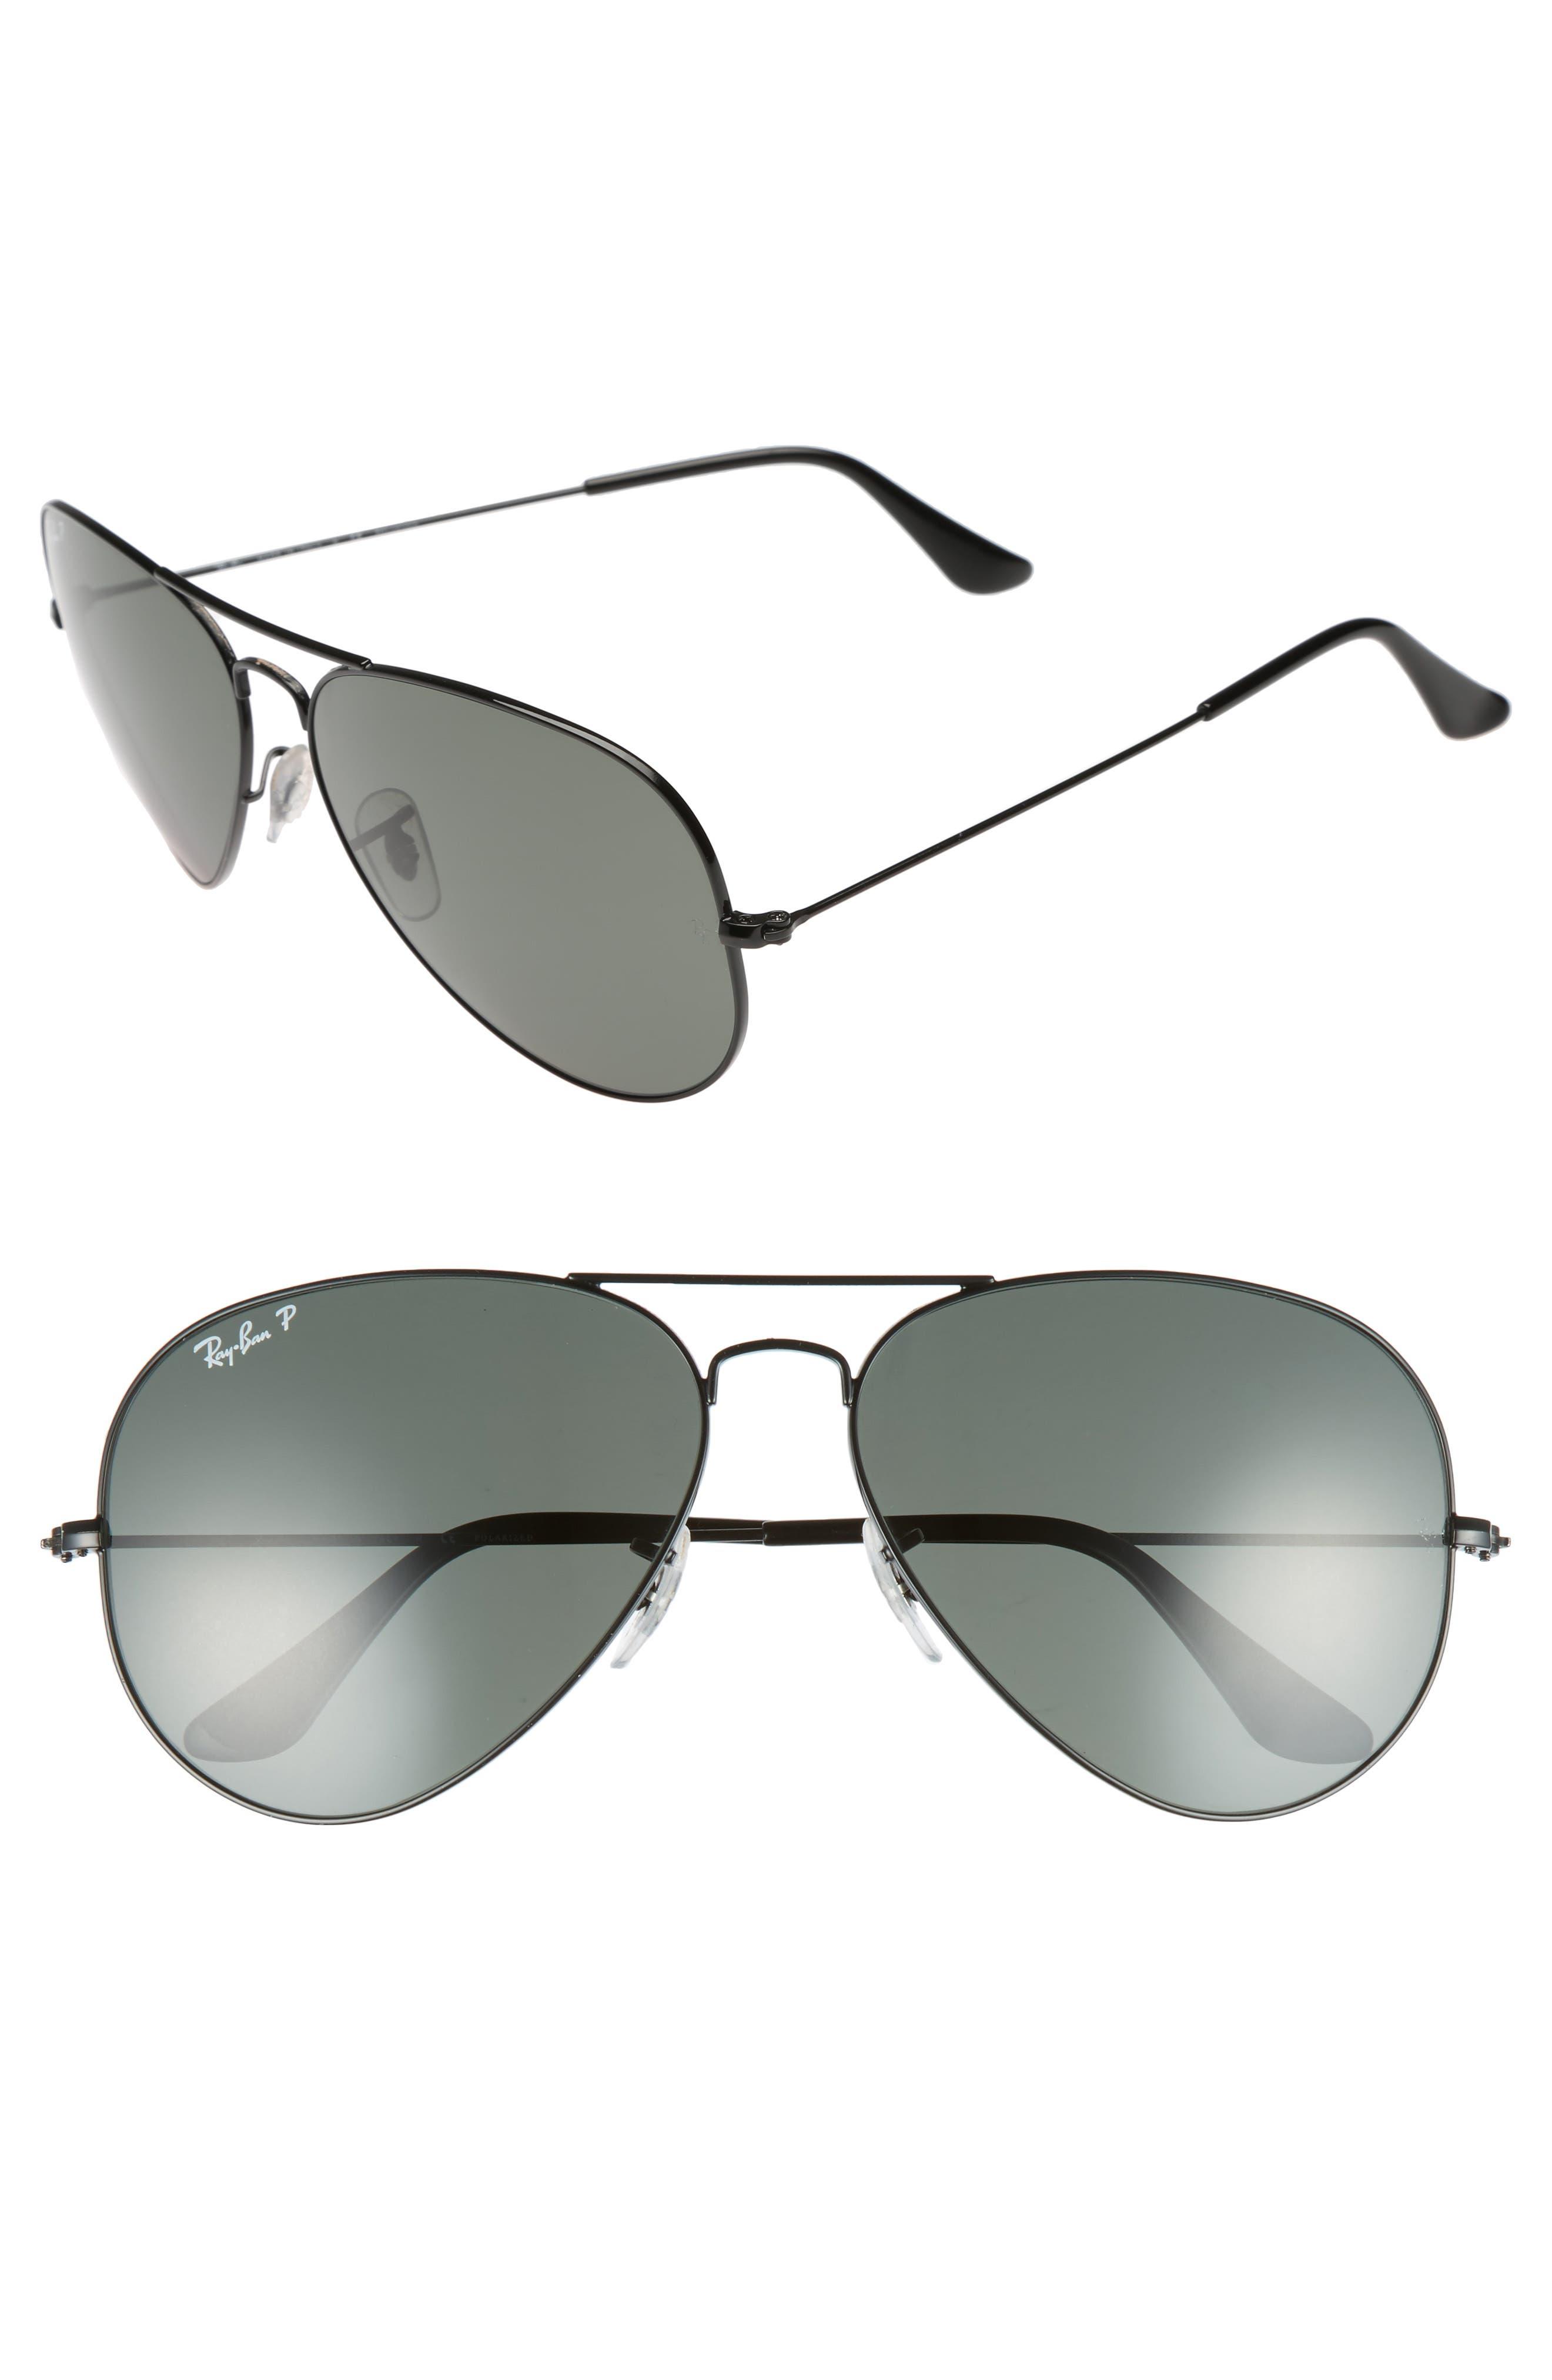 Main Image - Ray-Ban Original 62mm Polarized Aviator Sunglasses